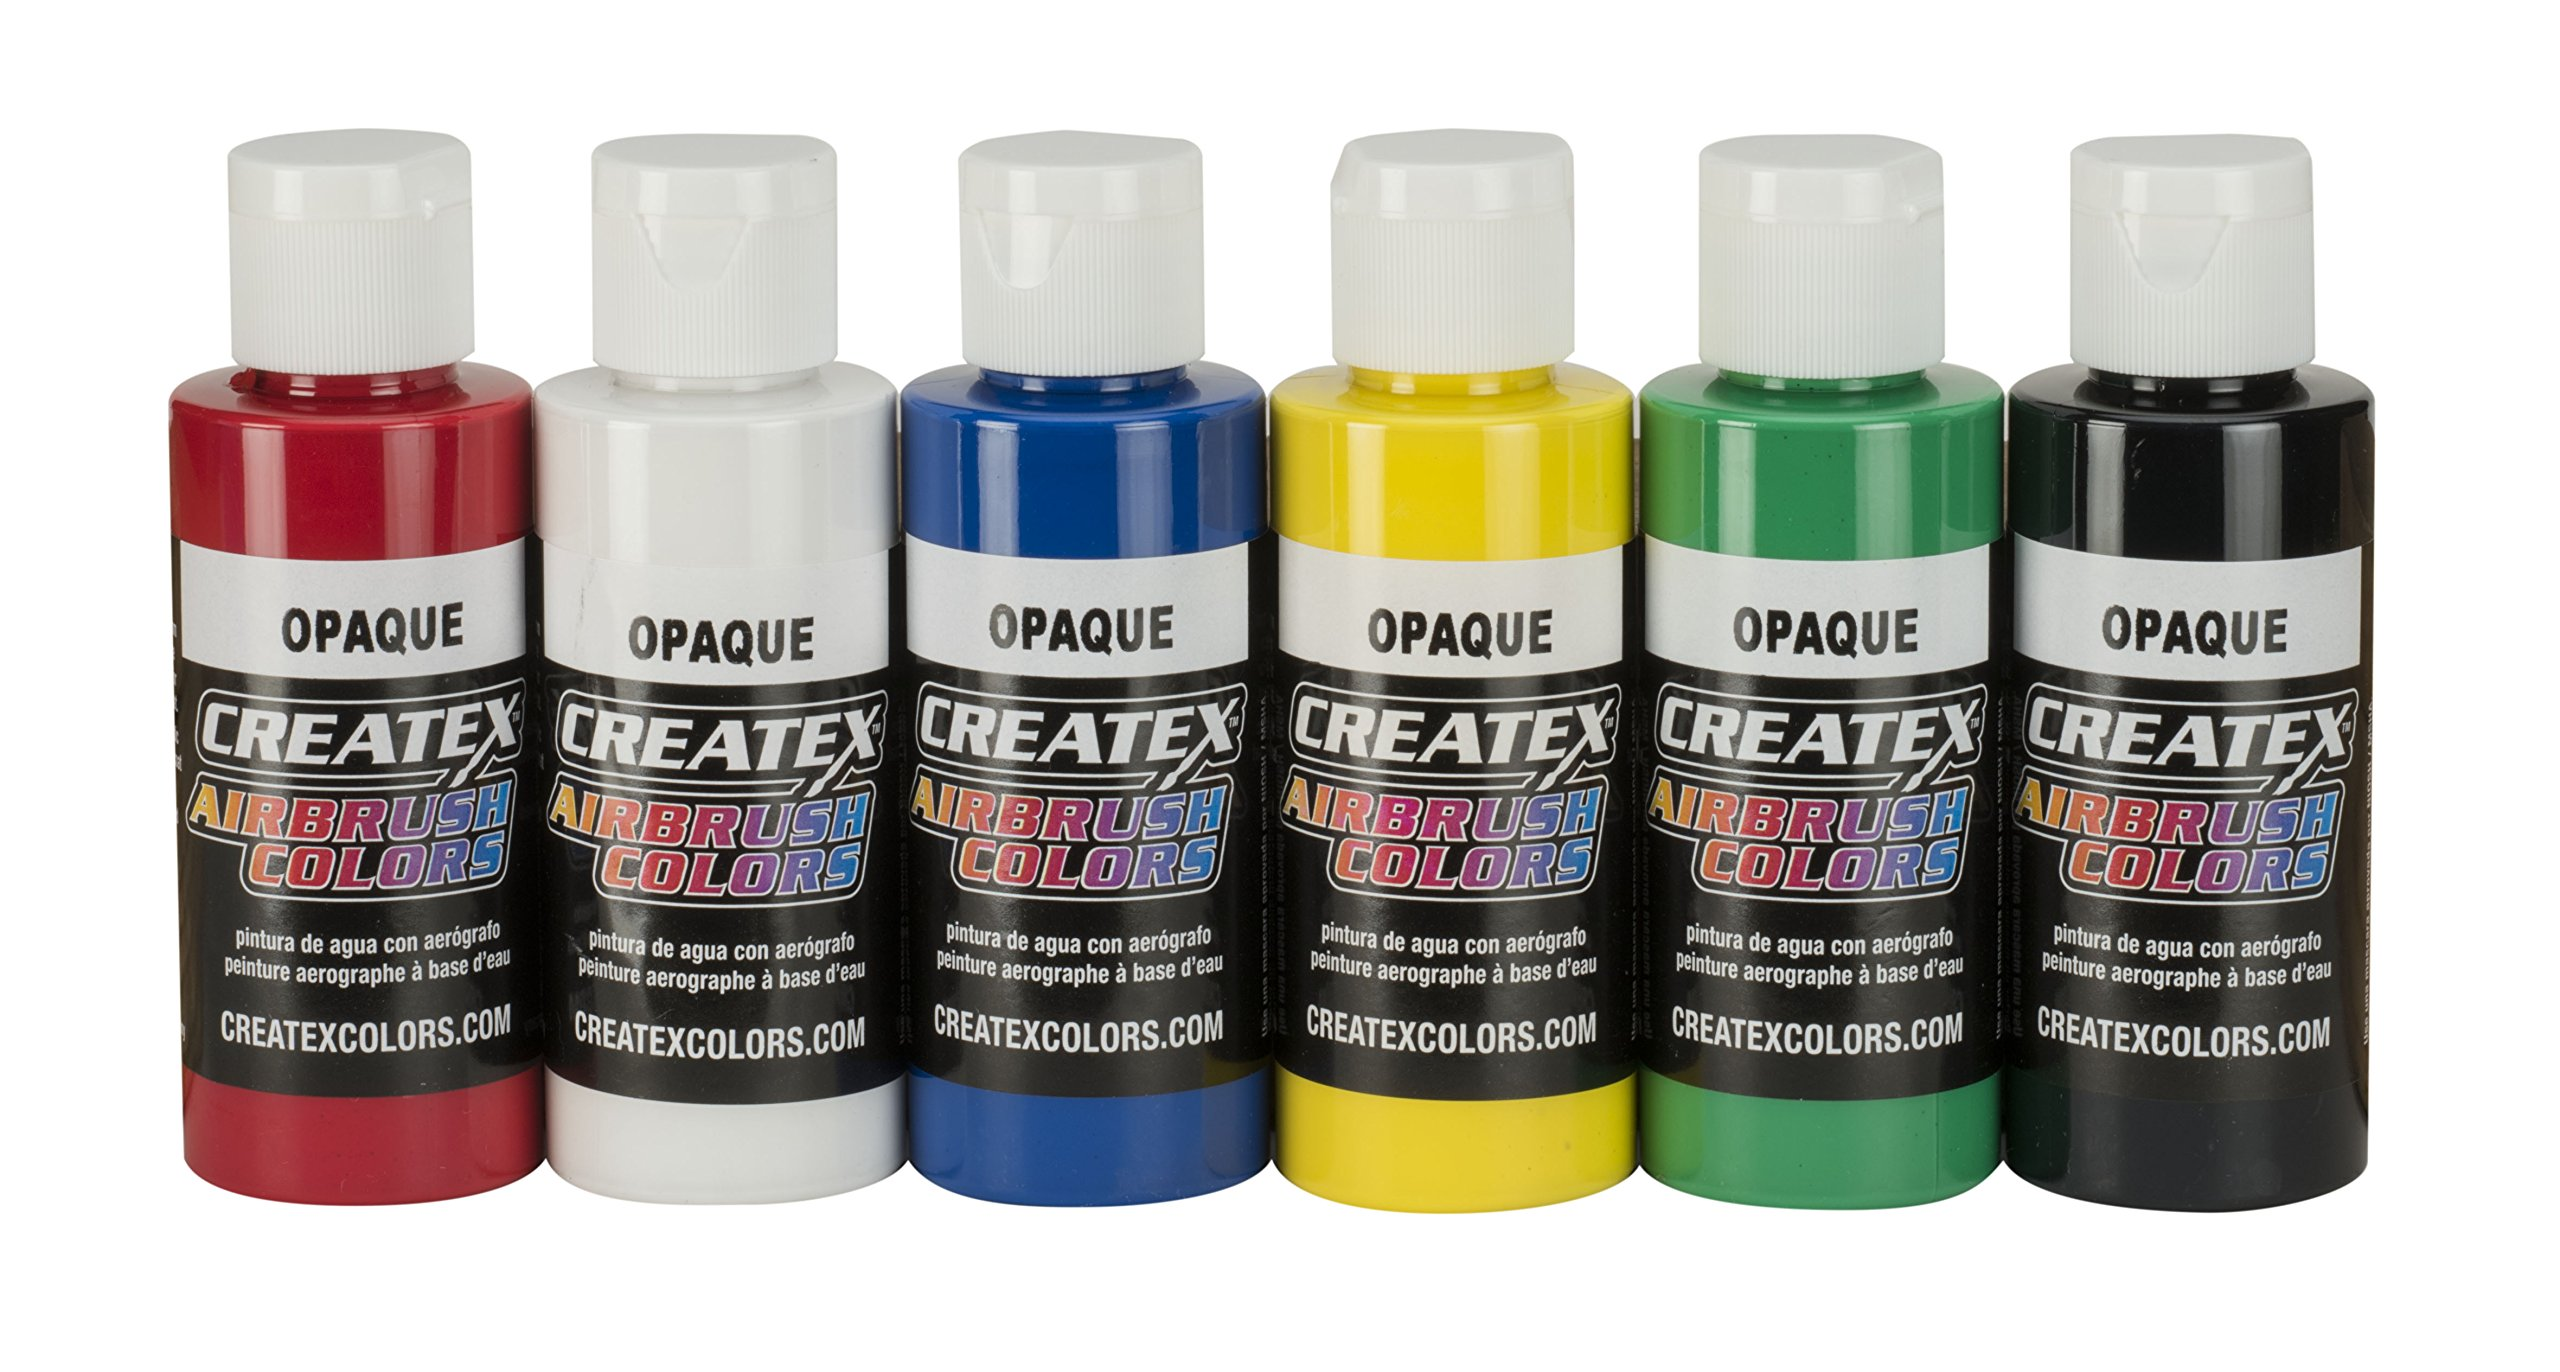 Createx Colors 5803-00 2 oz Opaque Airbrush Paint Set, 2 Ounce (Pack of 6), Multicolor, 12 Fl Oz